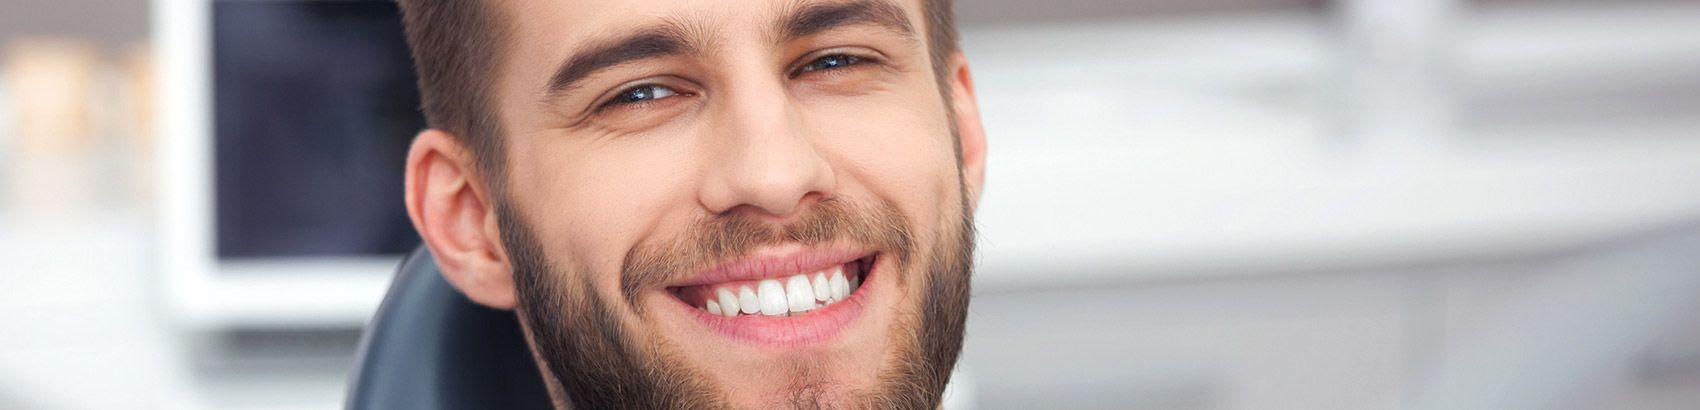 Extractions - Asuncion Dental Group